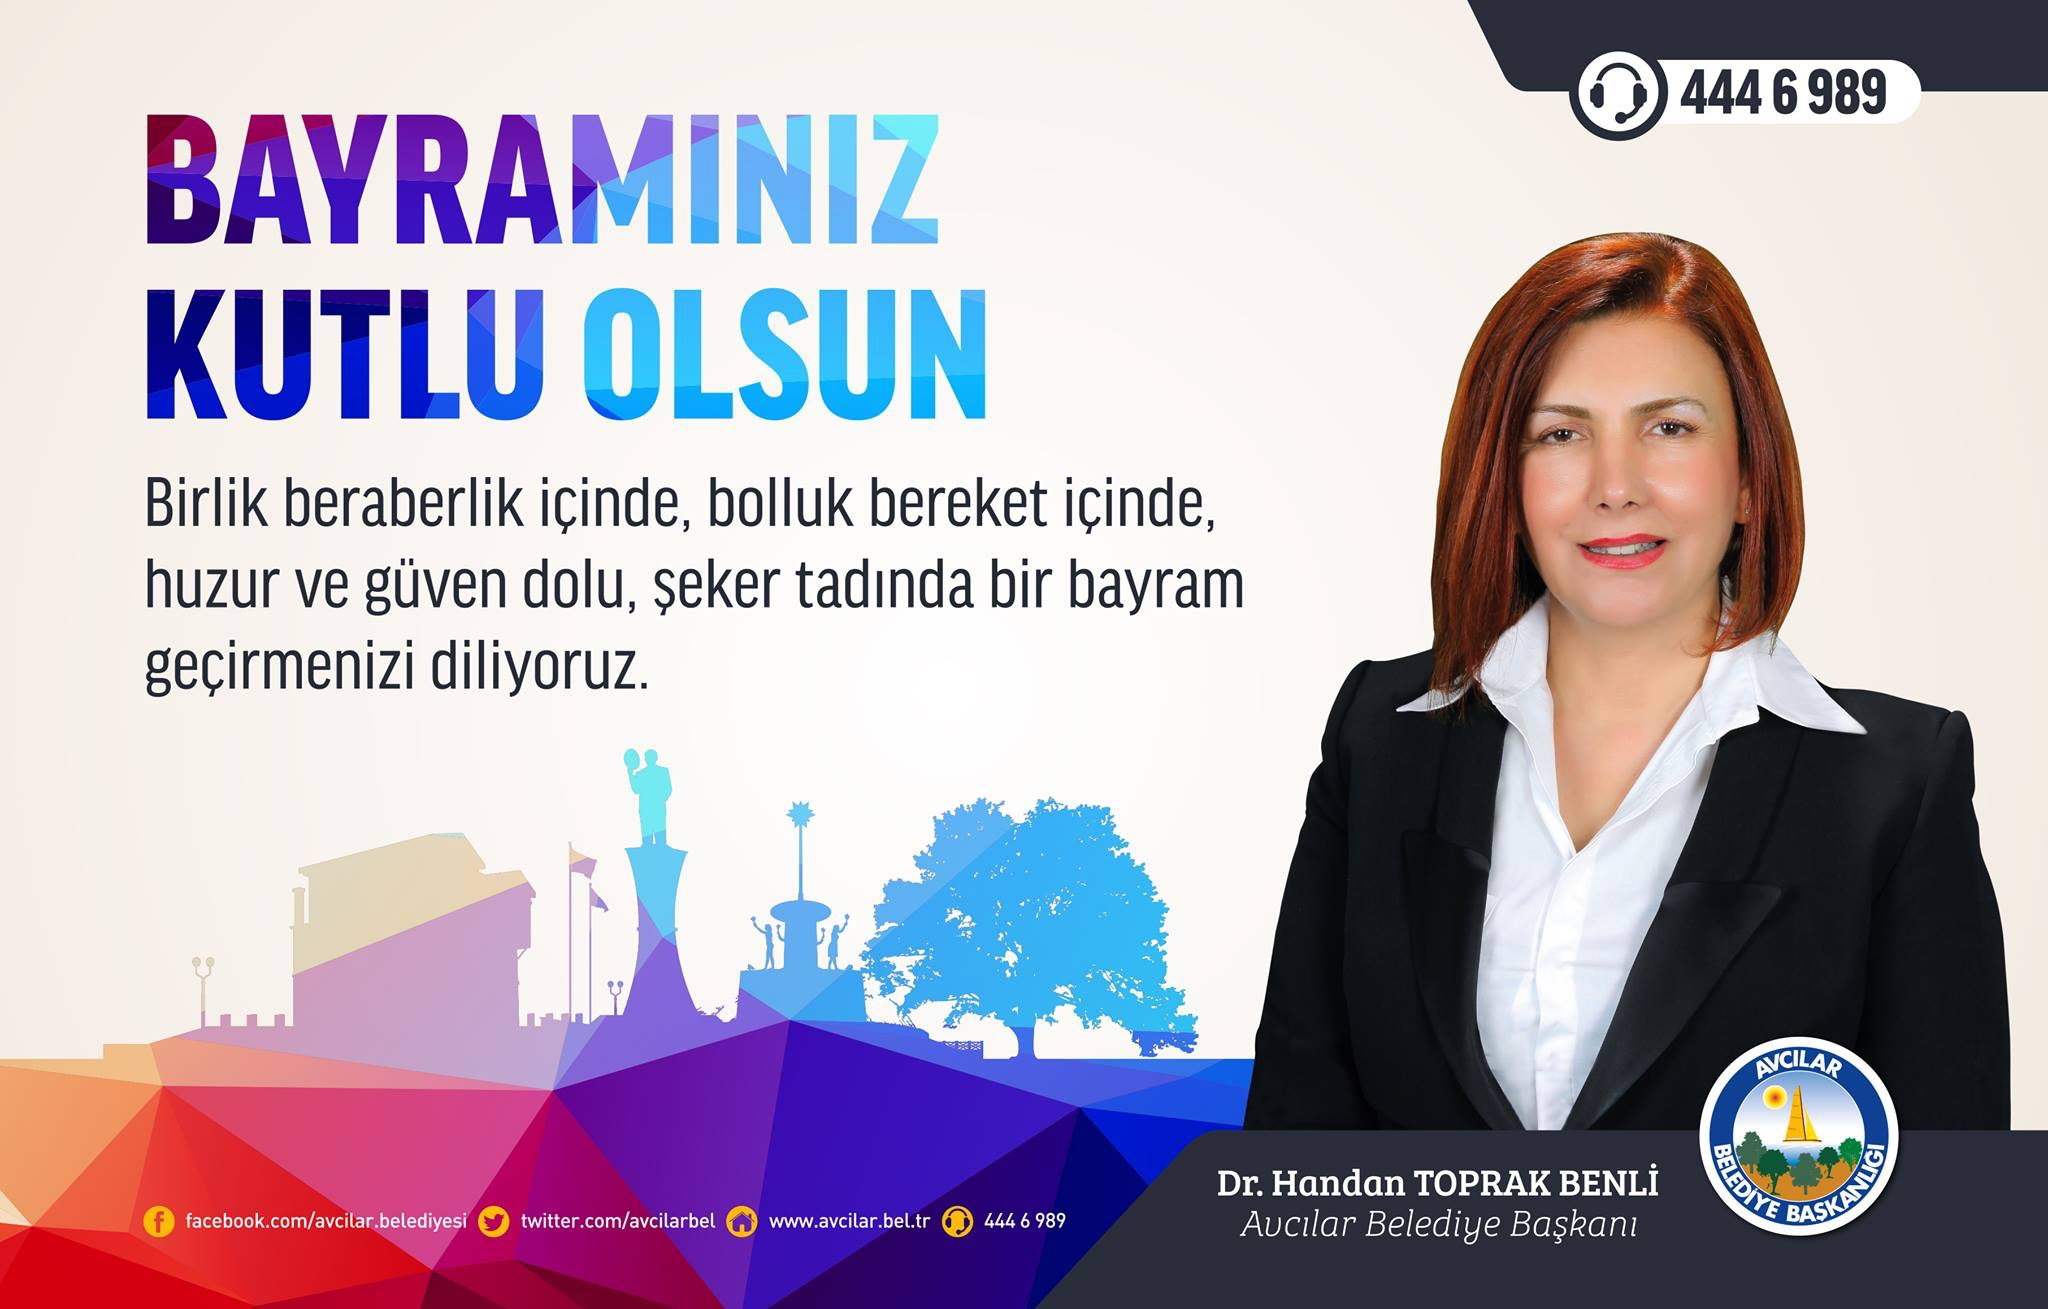 HANDAN TOPRAK'TAN BAYRAM KUTLAMASI